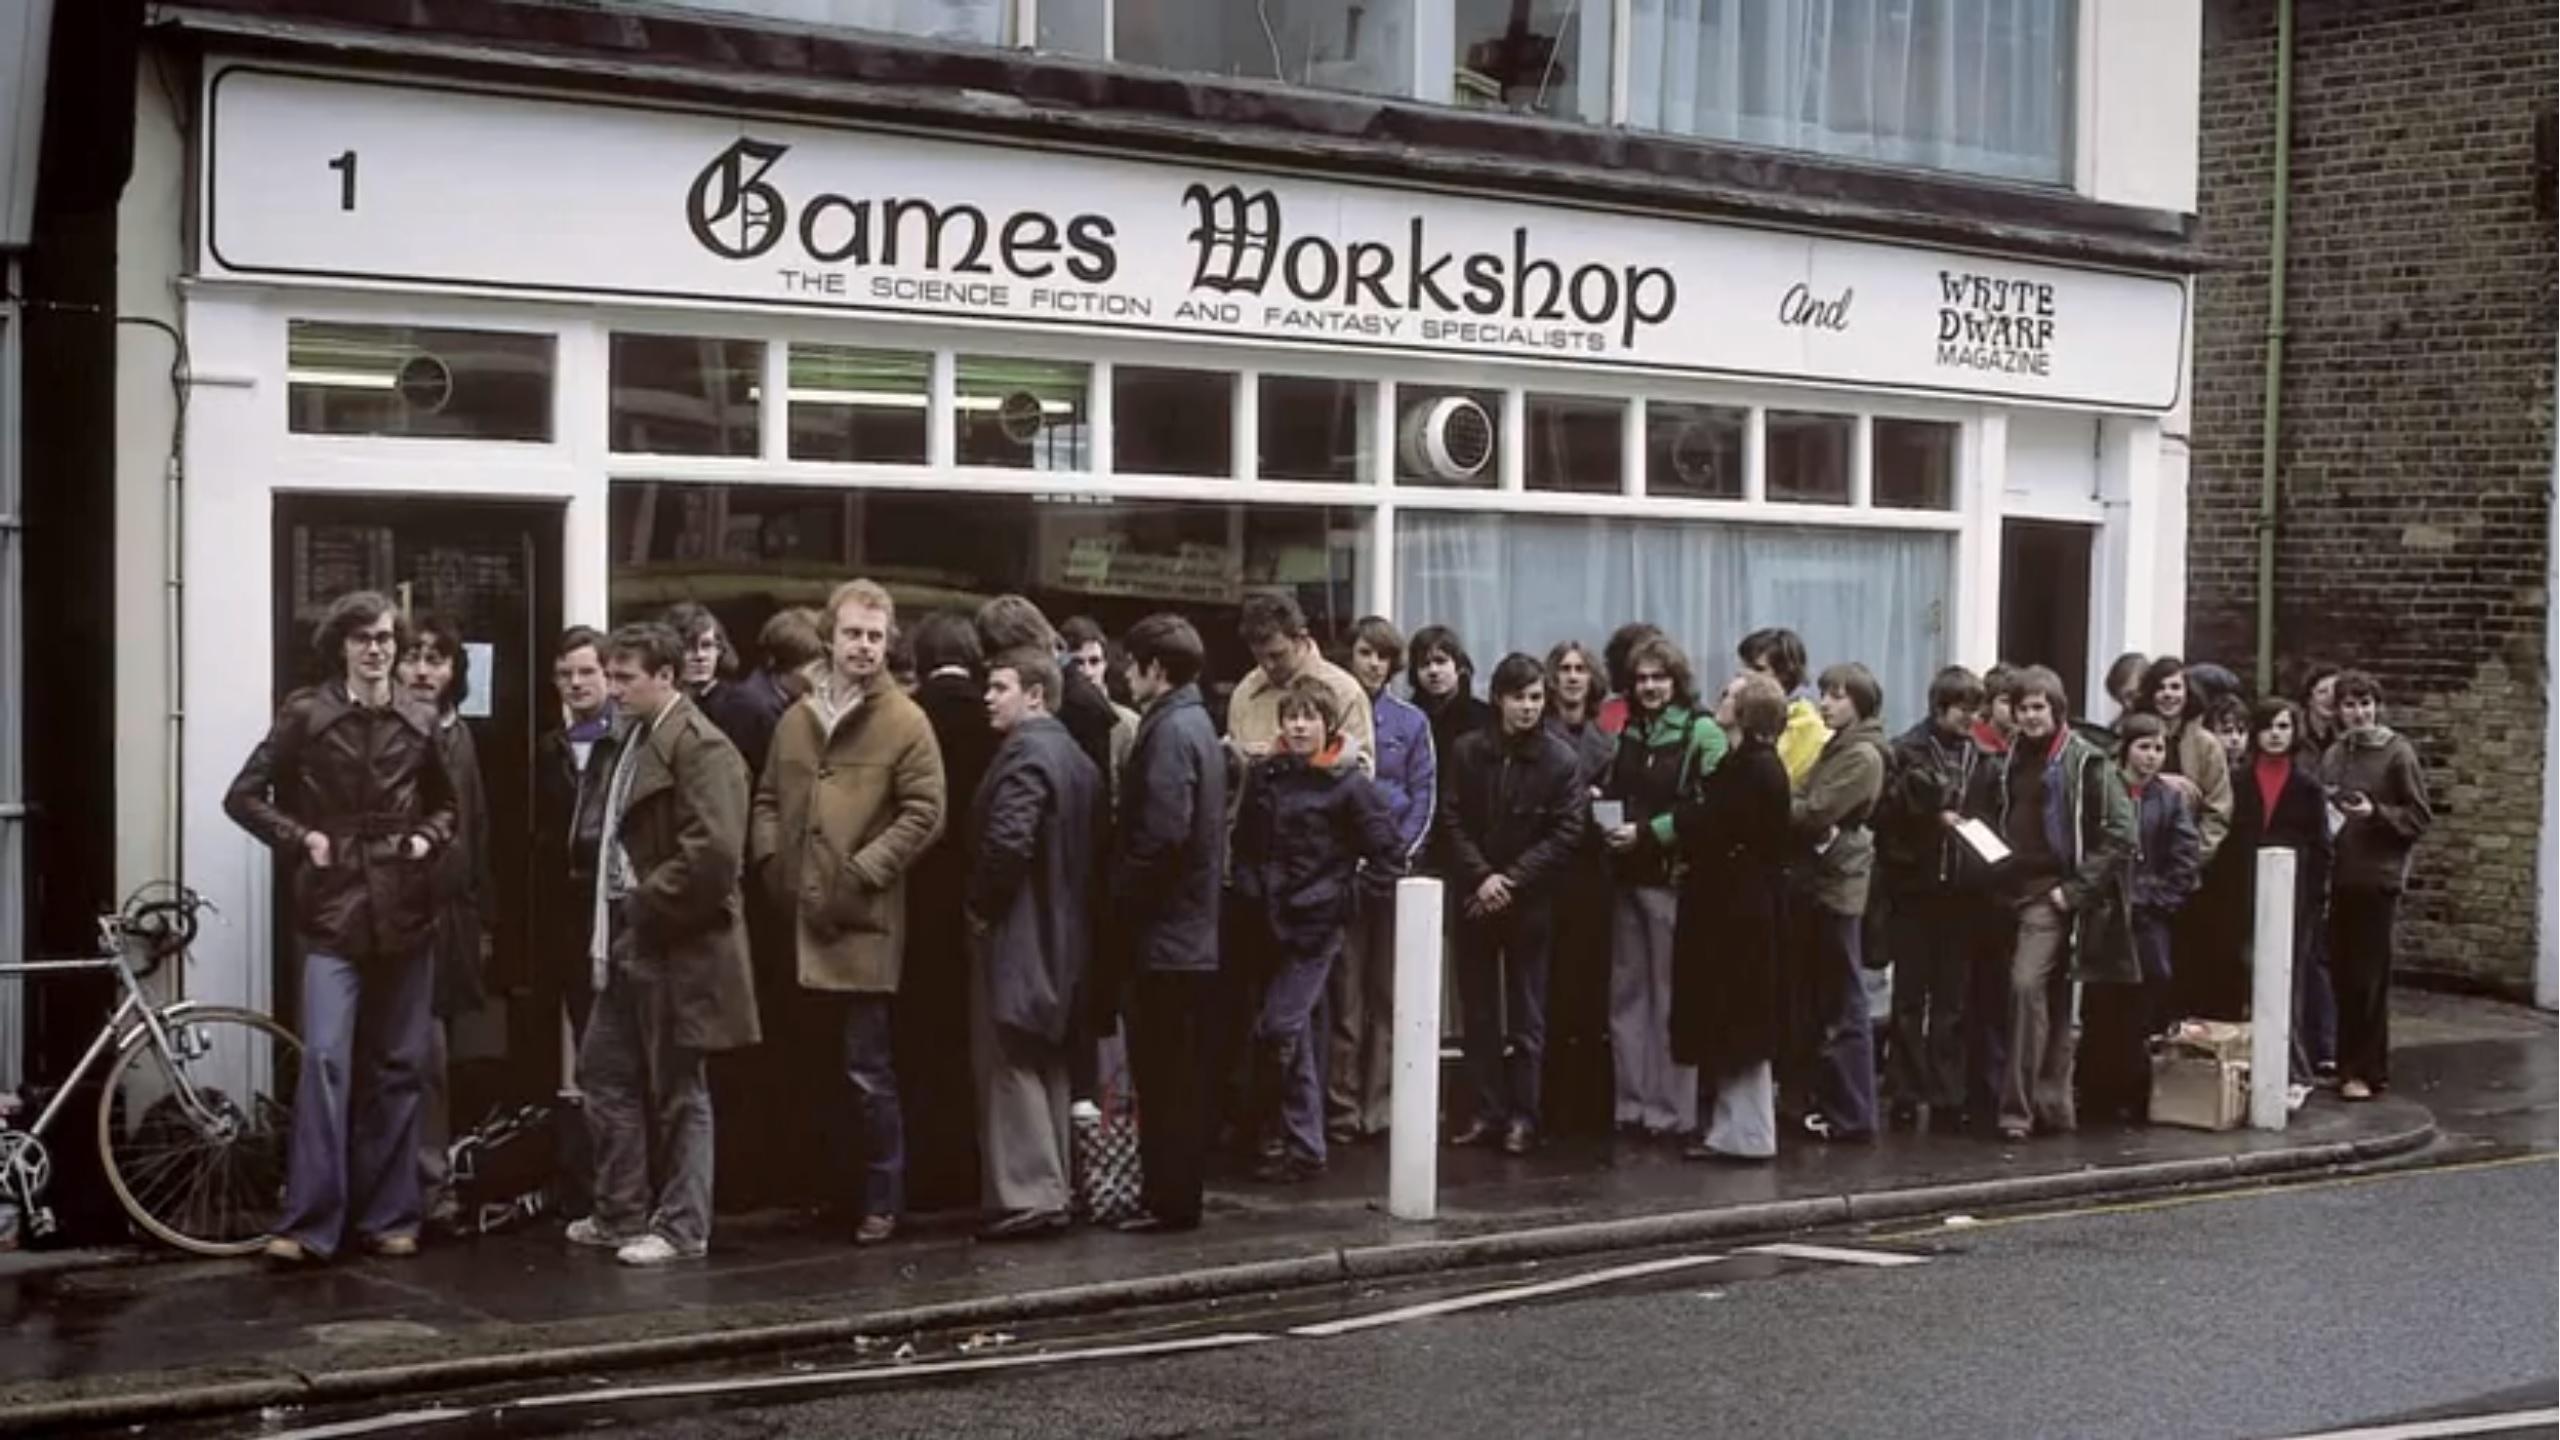 Gambling workshops states with gambling age of 18